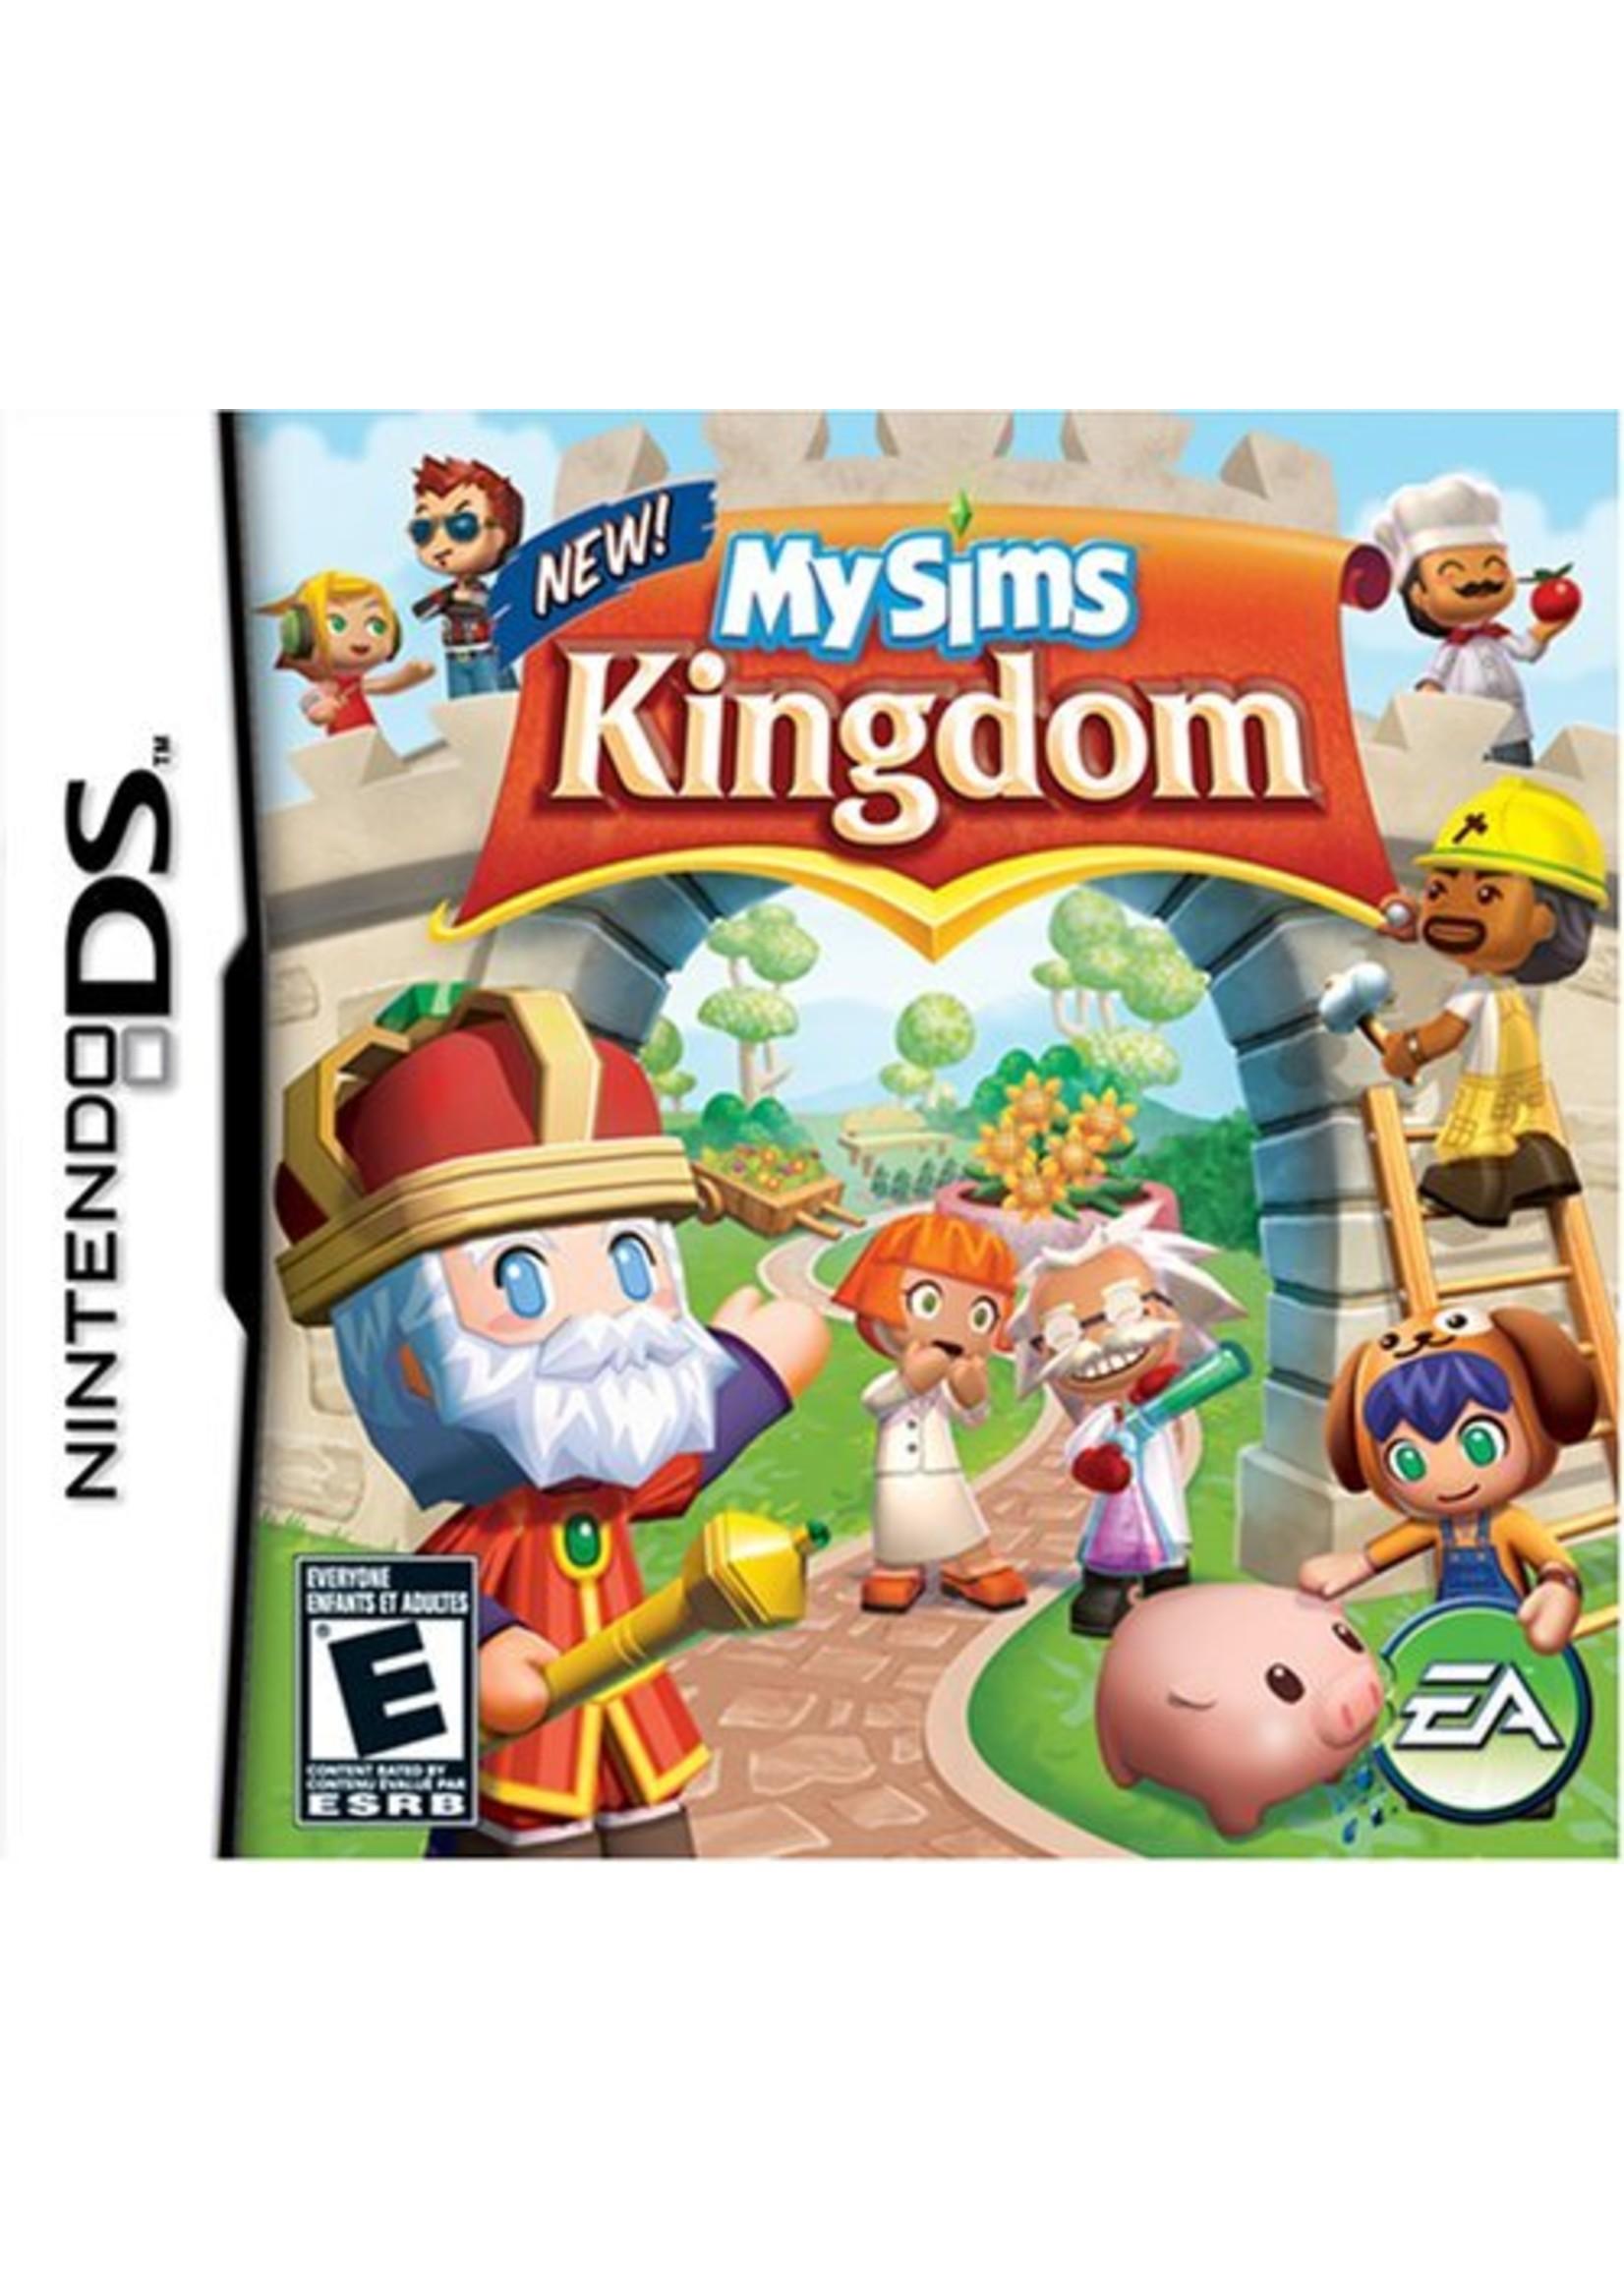 My Sims Kingdom - NDS PrePlayed